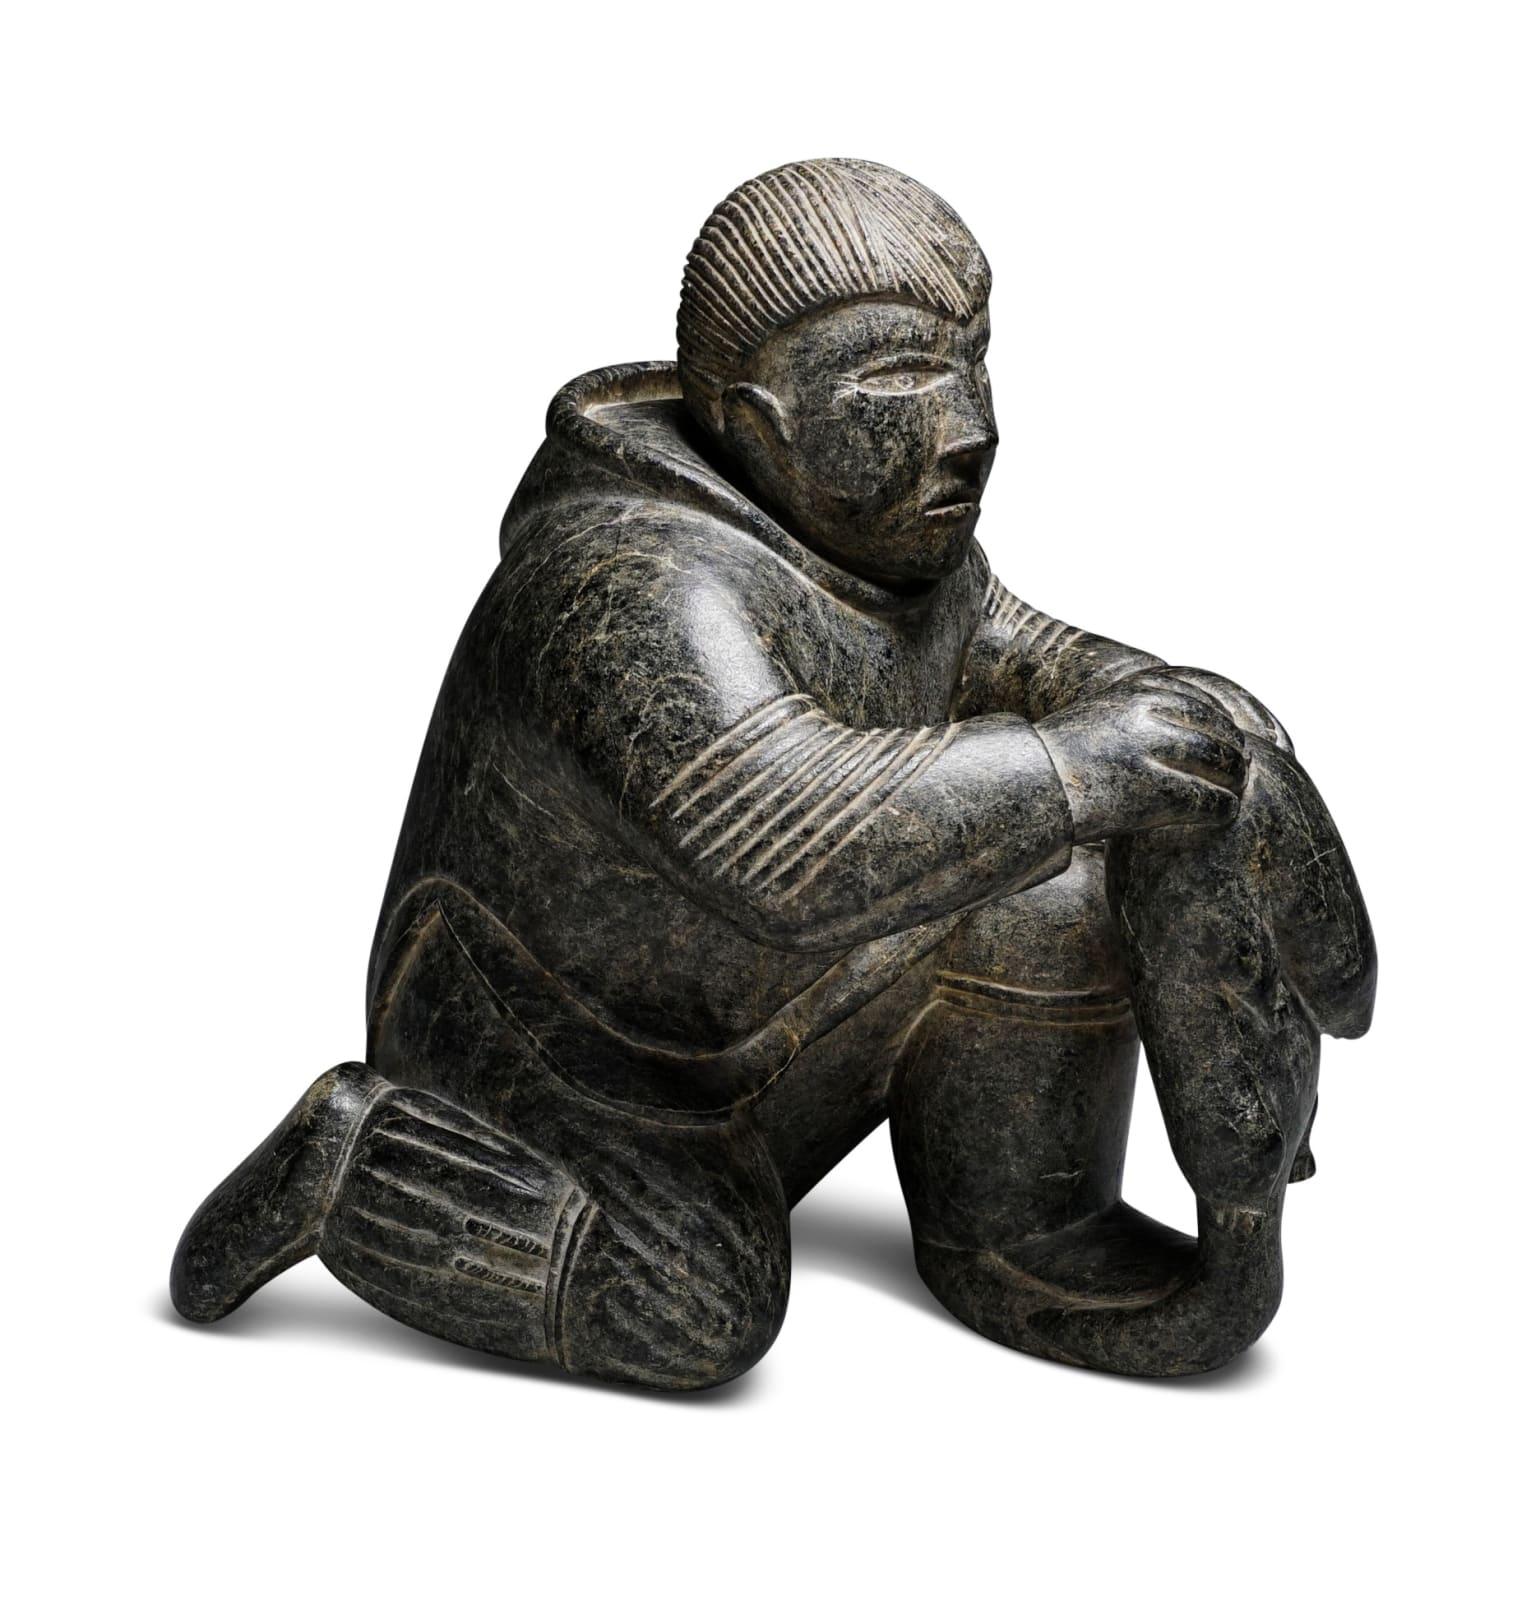 LOT 5 TIMOTHY QUANANAAPIK (1938-1984) PUVIRNITUQ (POVUNGNITUK) Hunter with Lemming, 1957 stone, 9 x 8 1/2 x 5 in (22.9 x 21.6 x 12.7 cm) ESTIMATE: $3,500 — $5,000